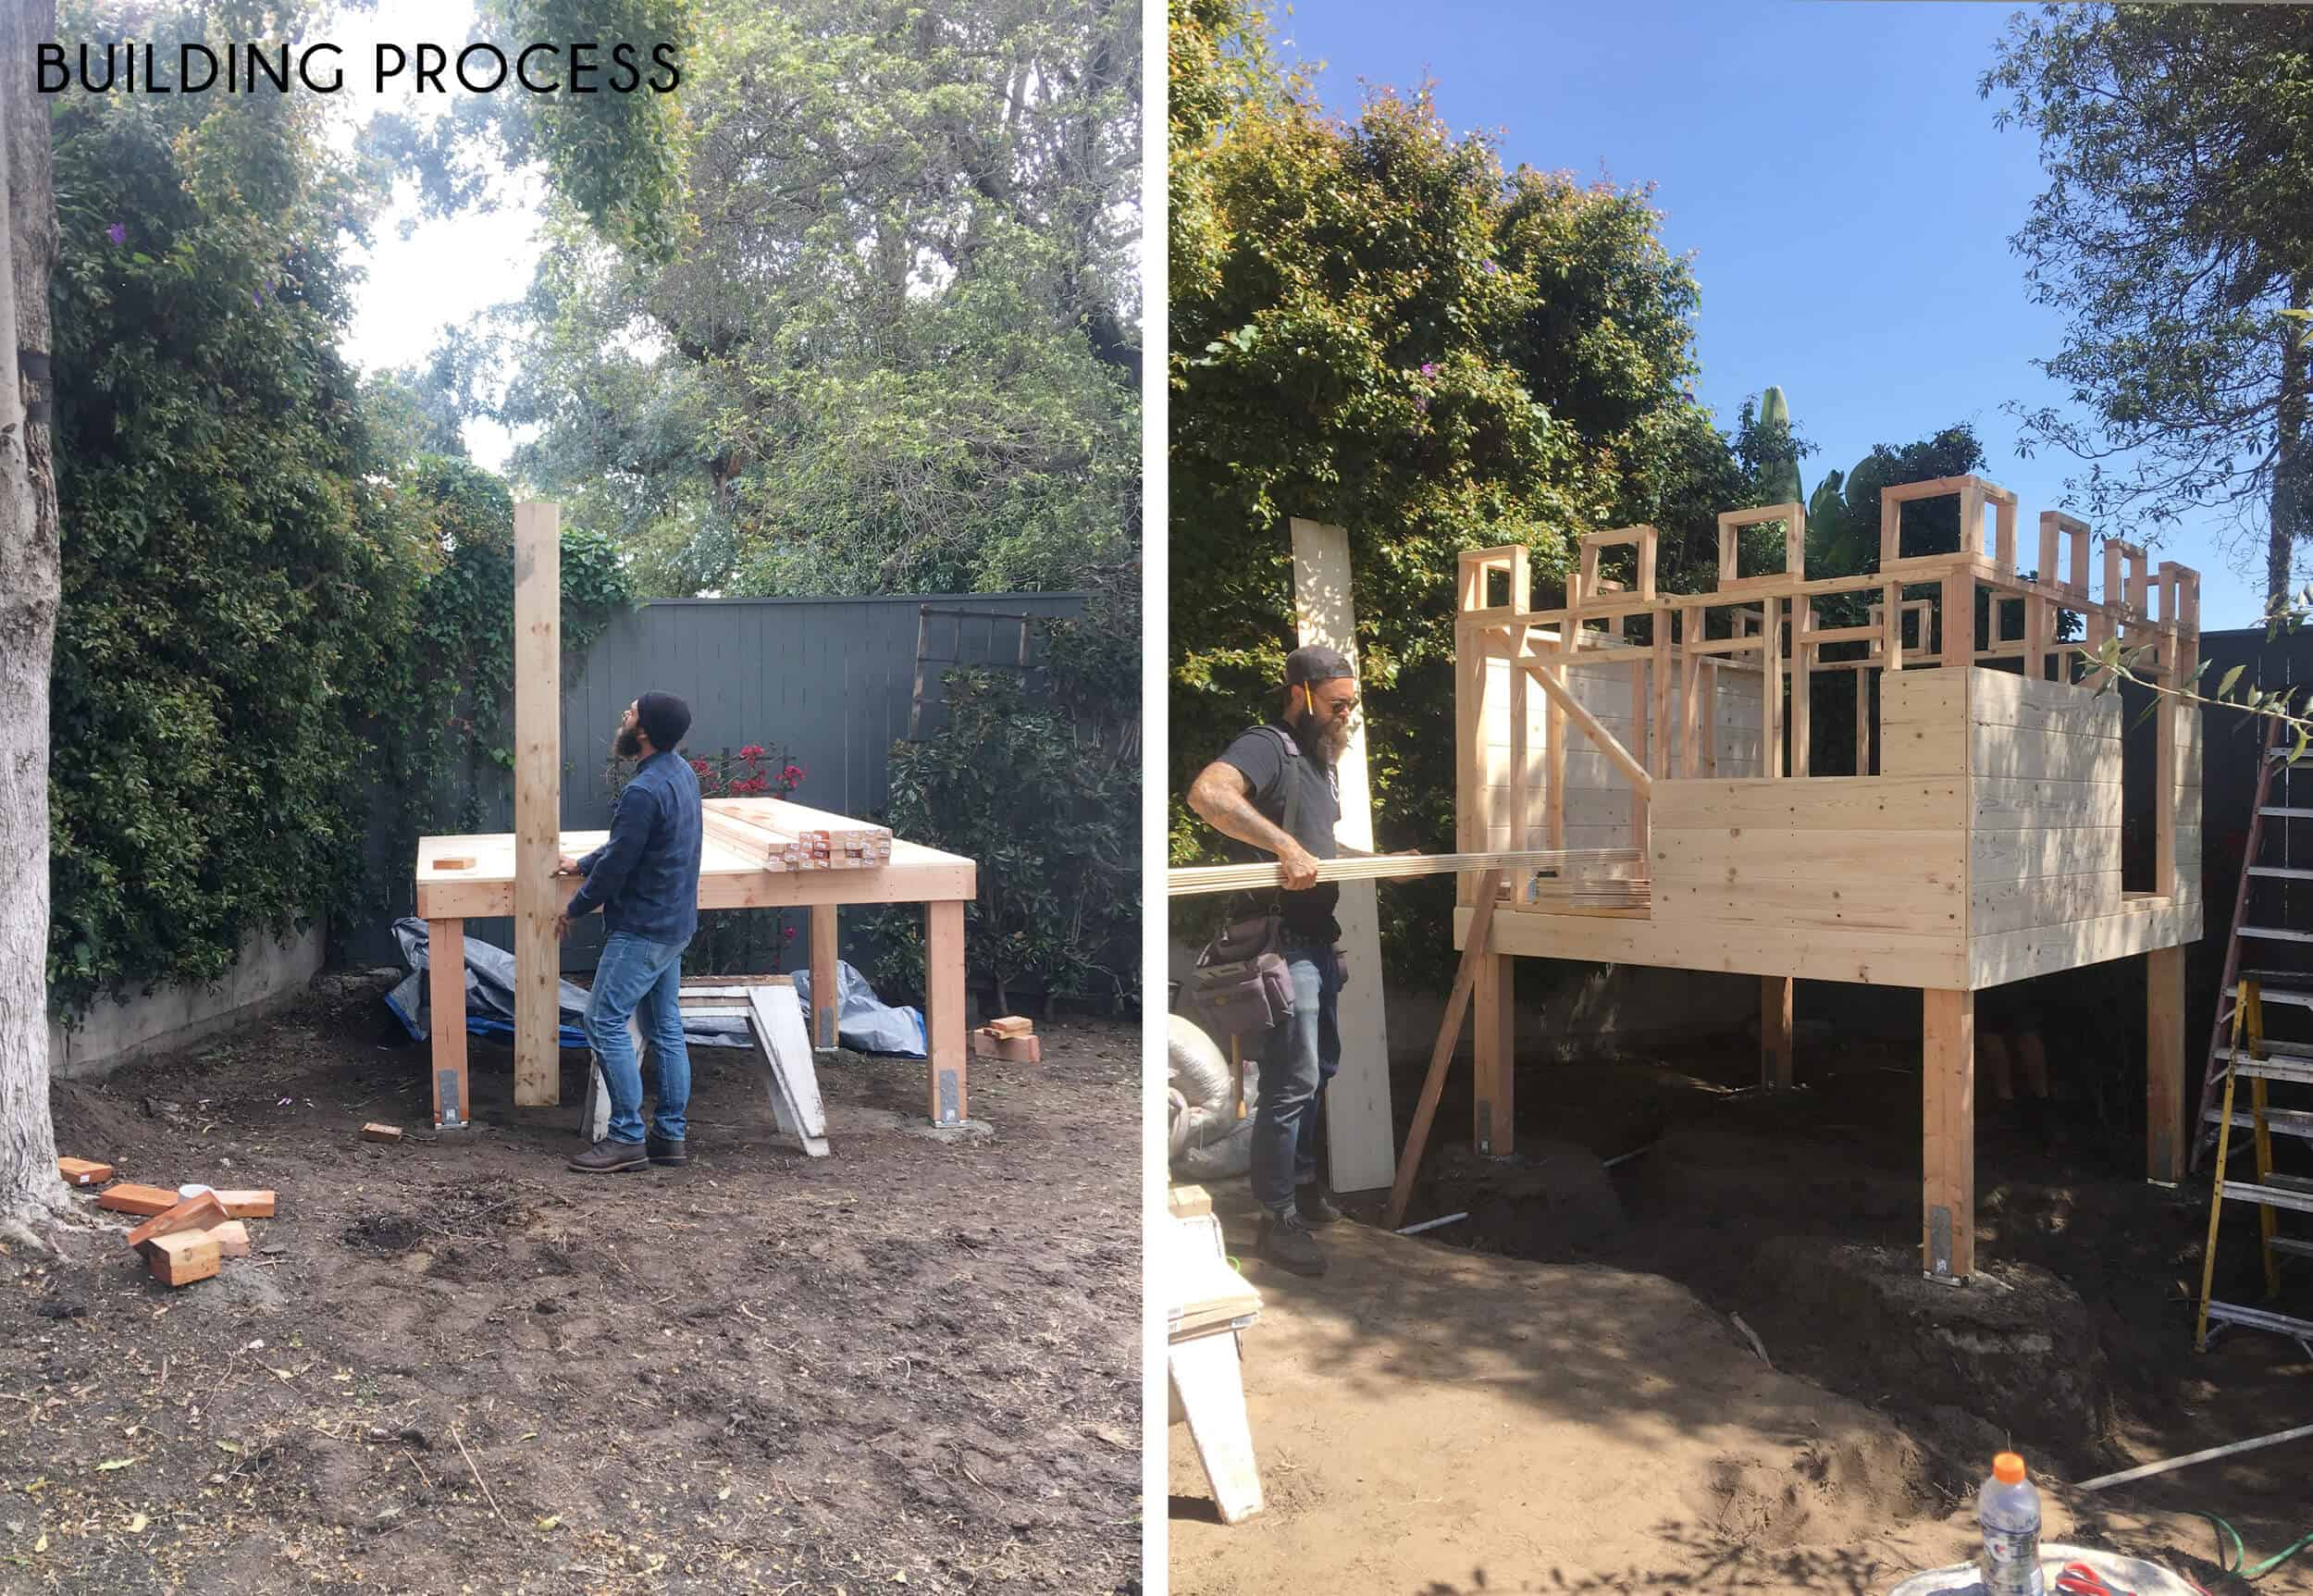 Emily-Henderson_Waverly_Backyard_Playfort_Castle_Building-Process